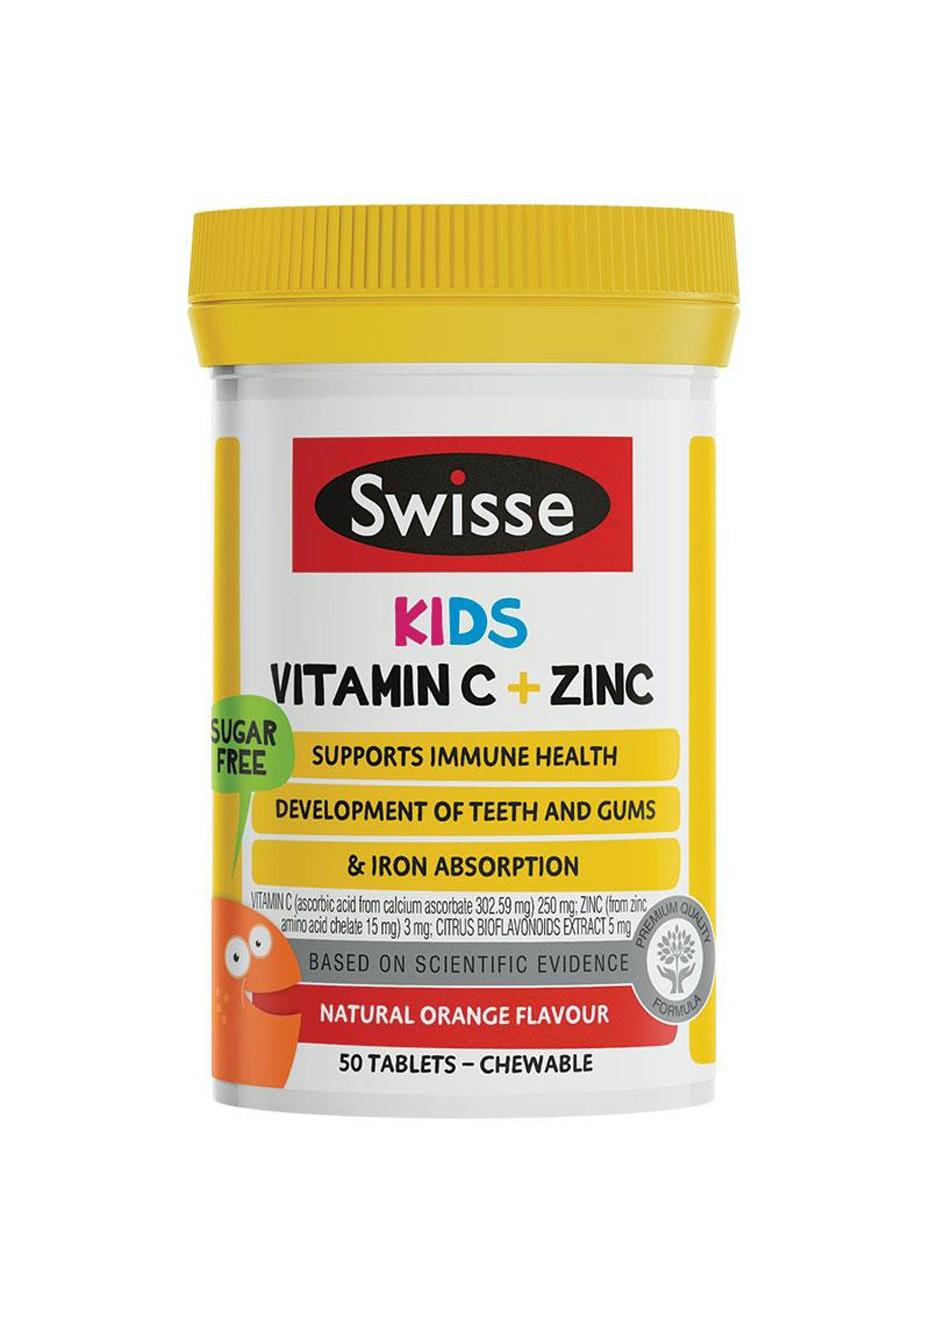 New! Swisse Kids Vitamin C & Zinc 50 Chewable Tablets